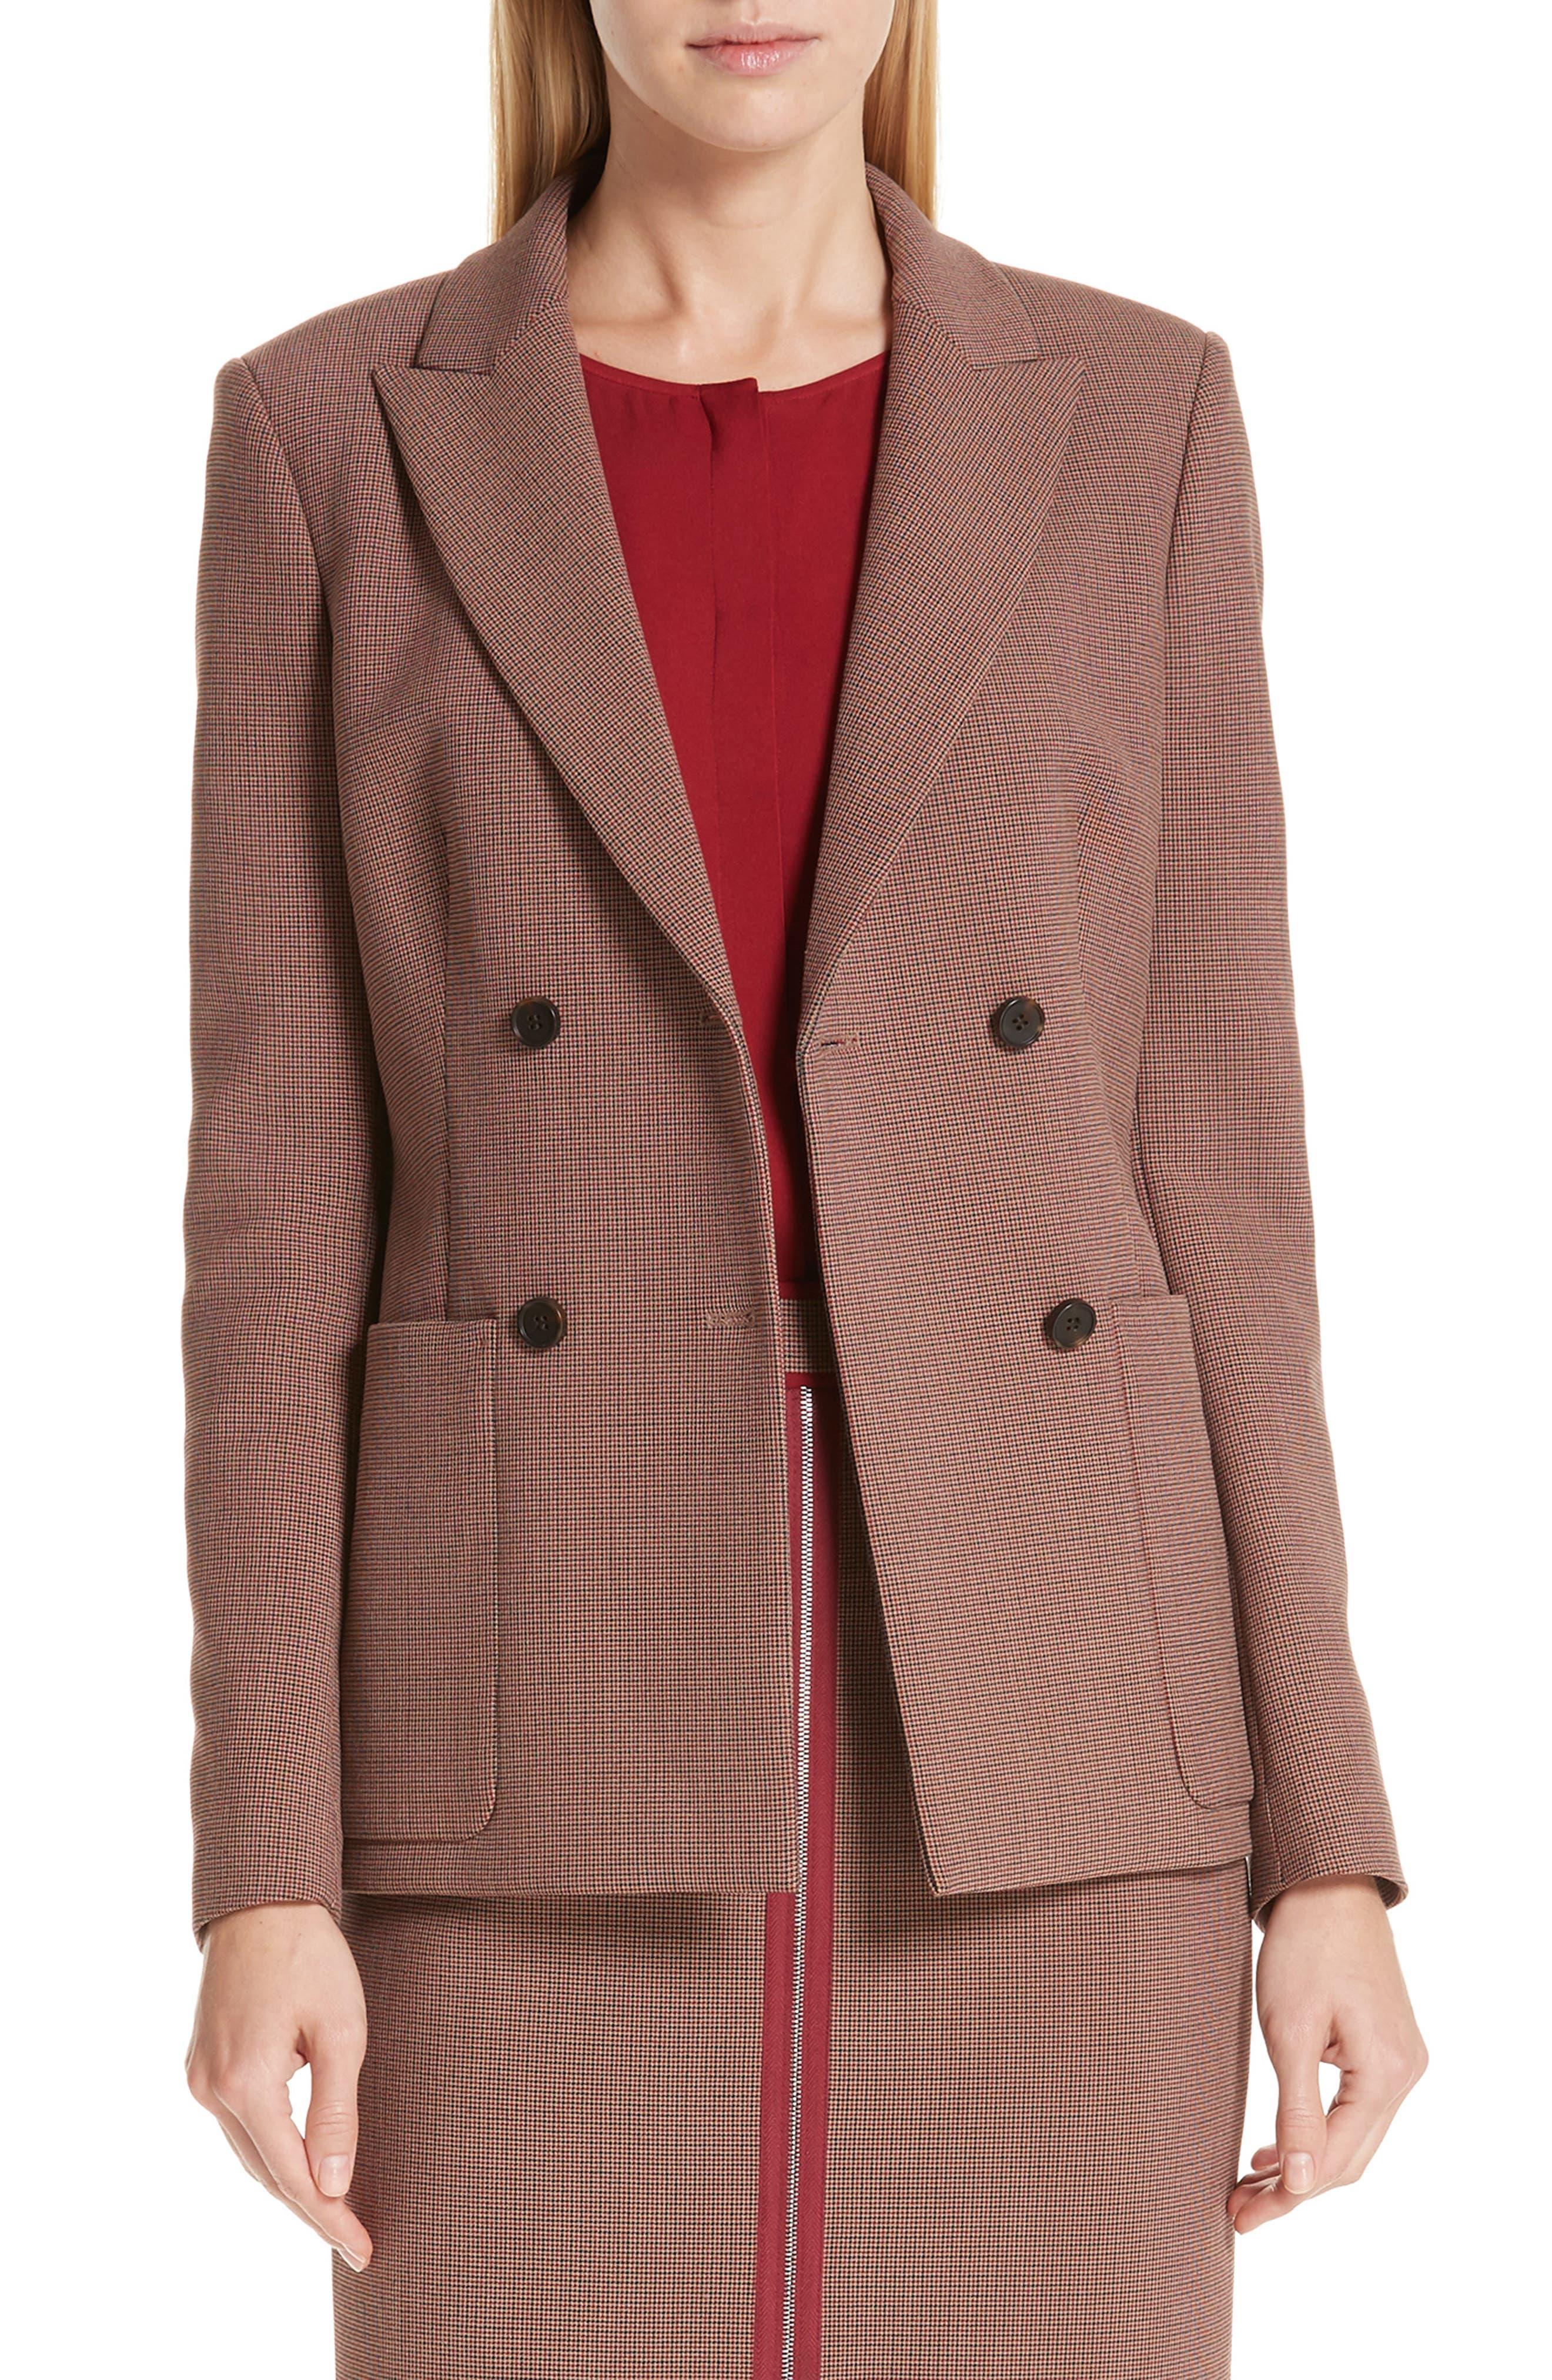 Joliviena Check Suit Jacket,                         Main,                         color, DARK RED CHECK